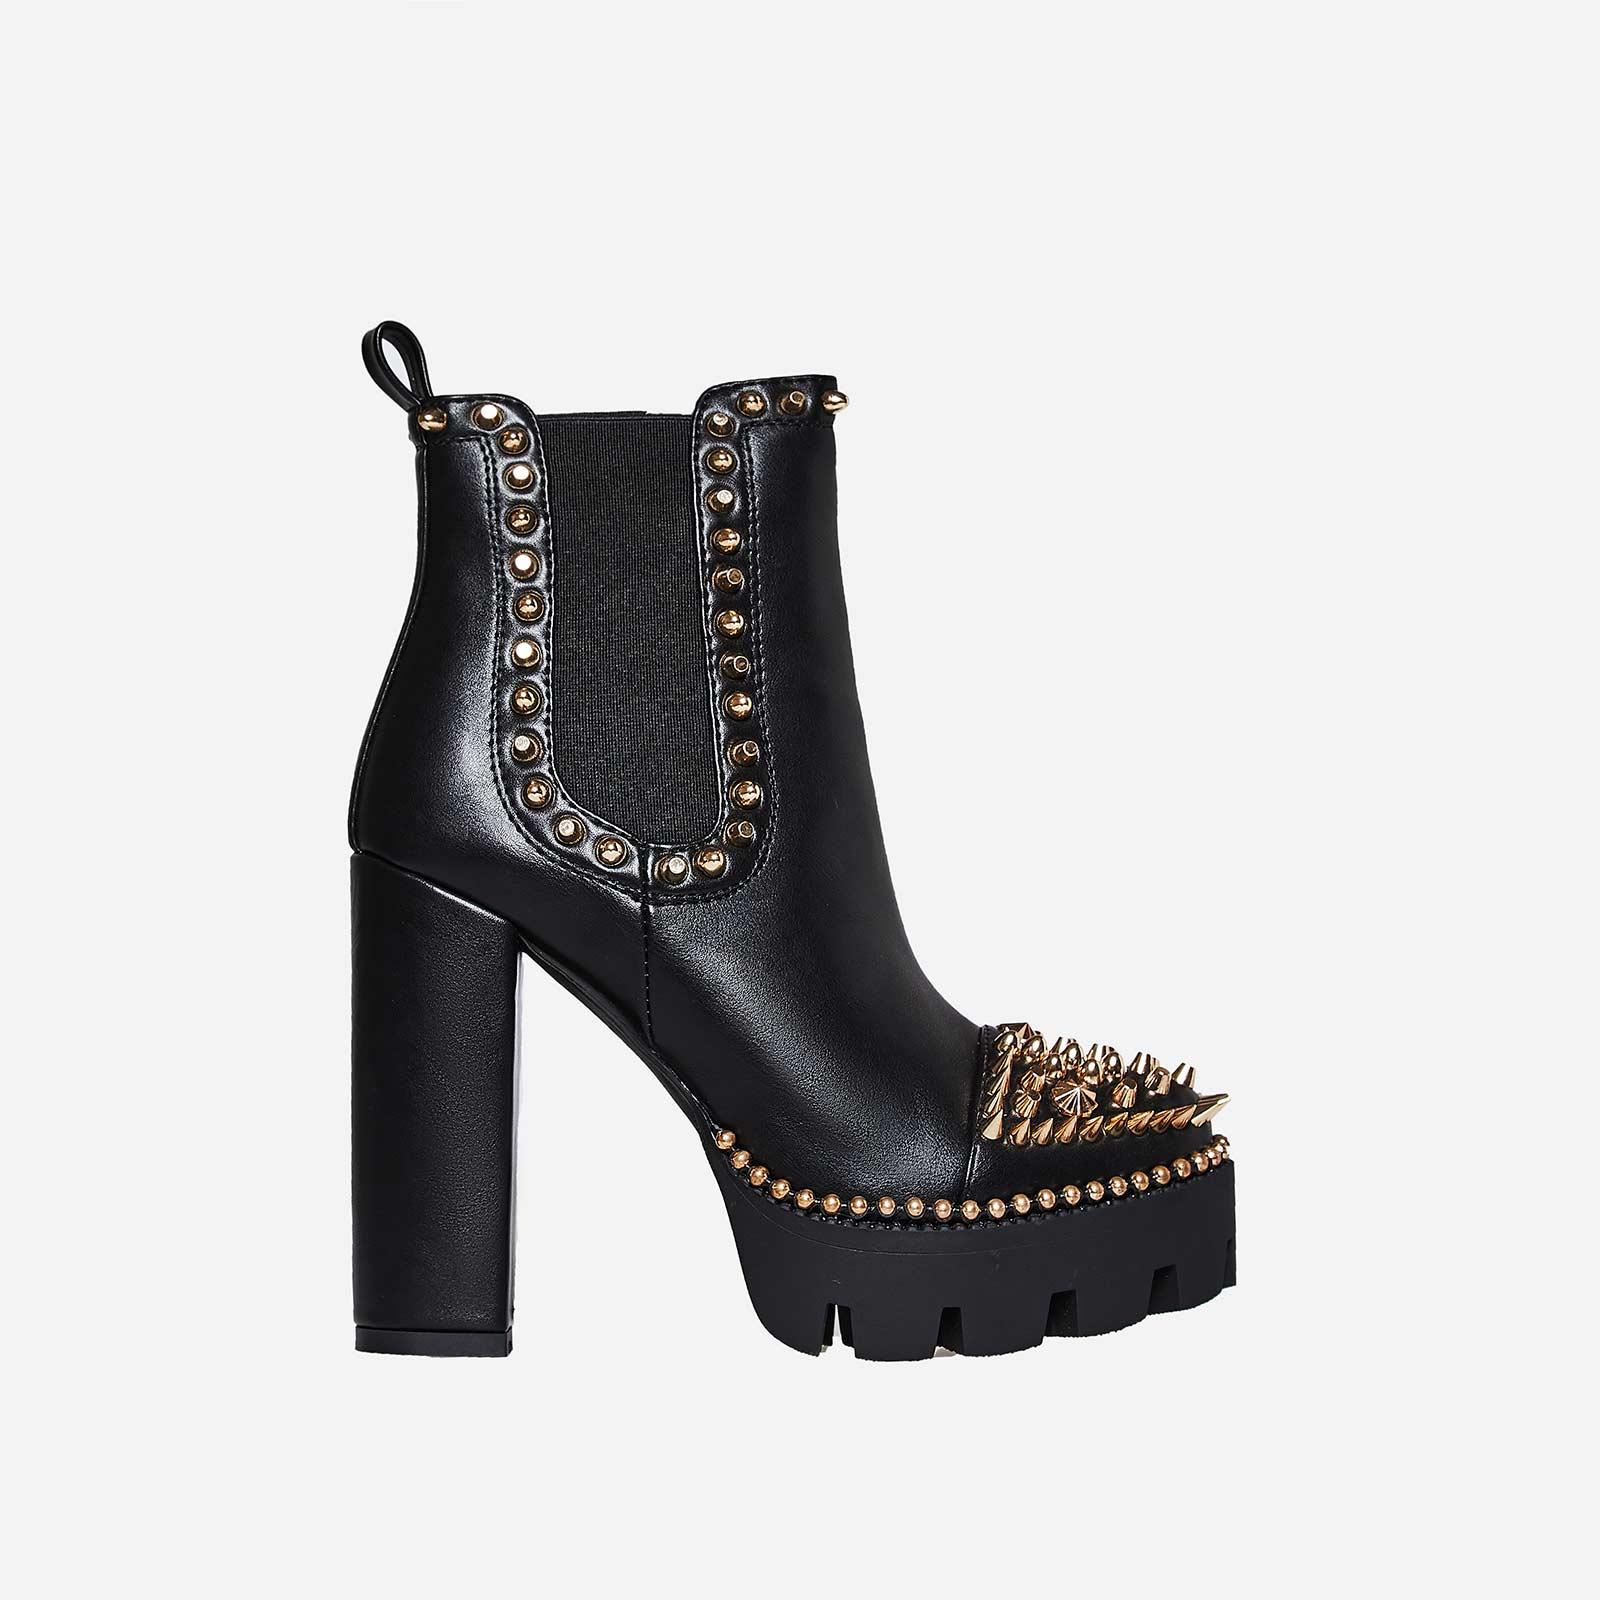 Domino Gold Studded Detail Platform Biker Boot In Black Faux Leather